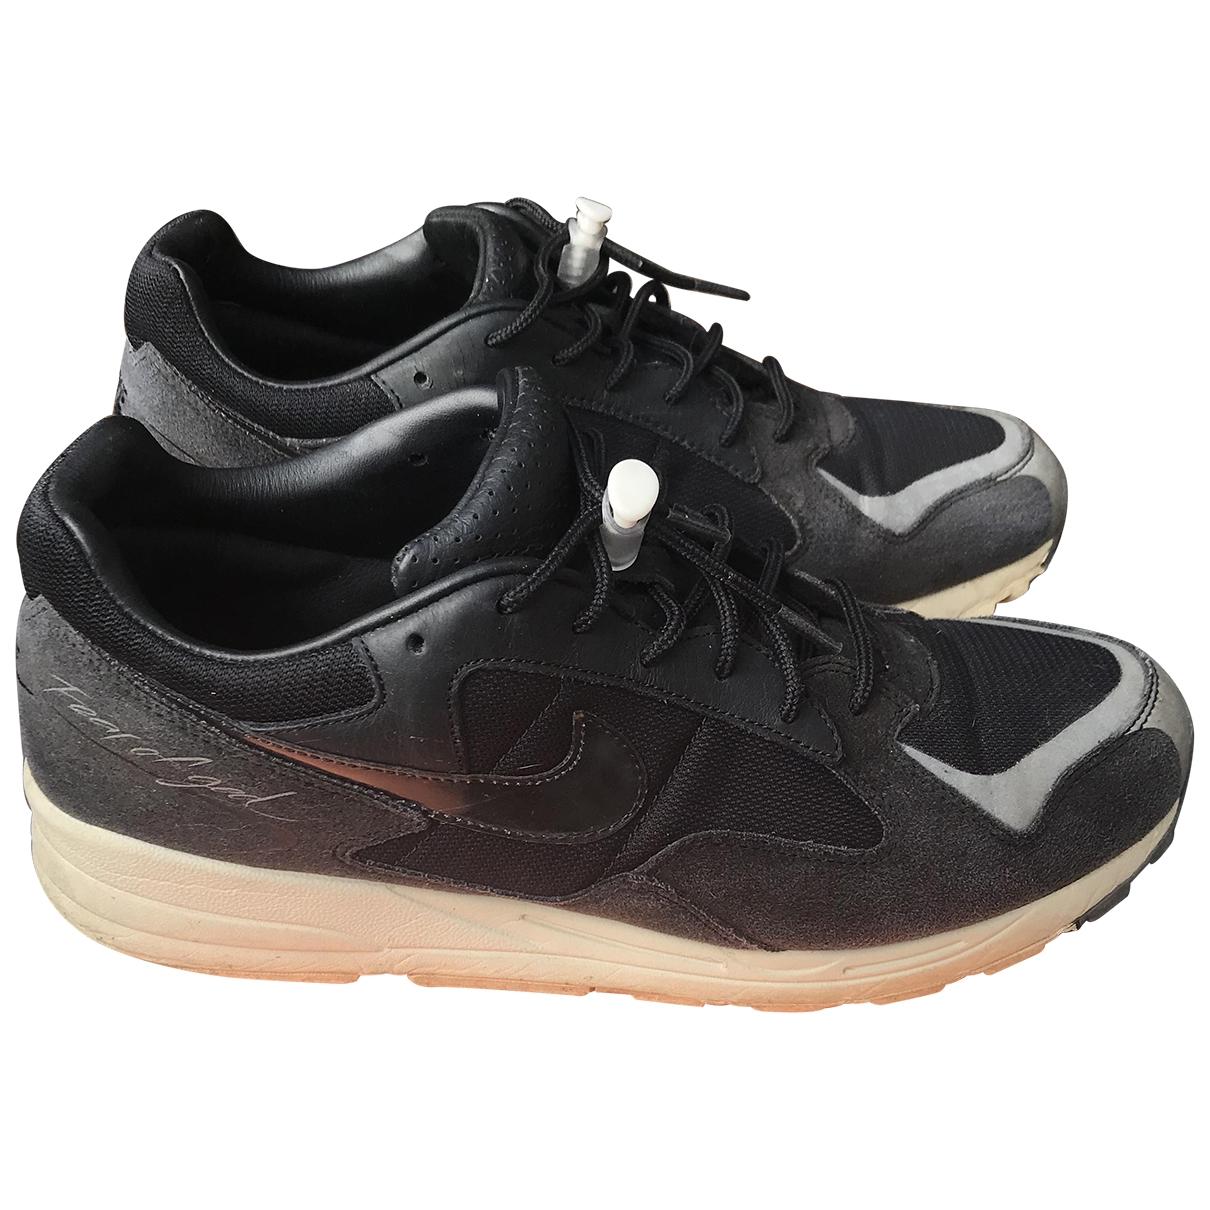 Nike X Fear Of God Air Skylon 2 Sneakers in  Schwarz Leder